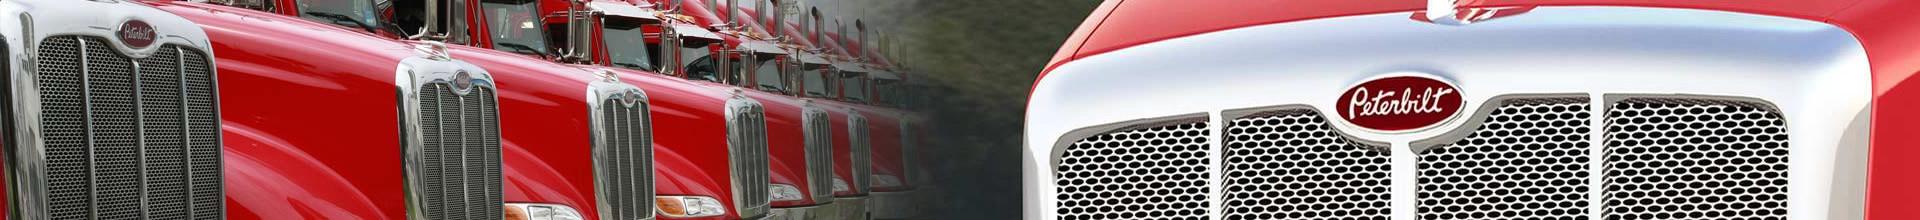 used peterbilt trucks inventory - international machinery